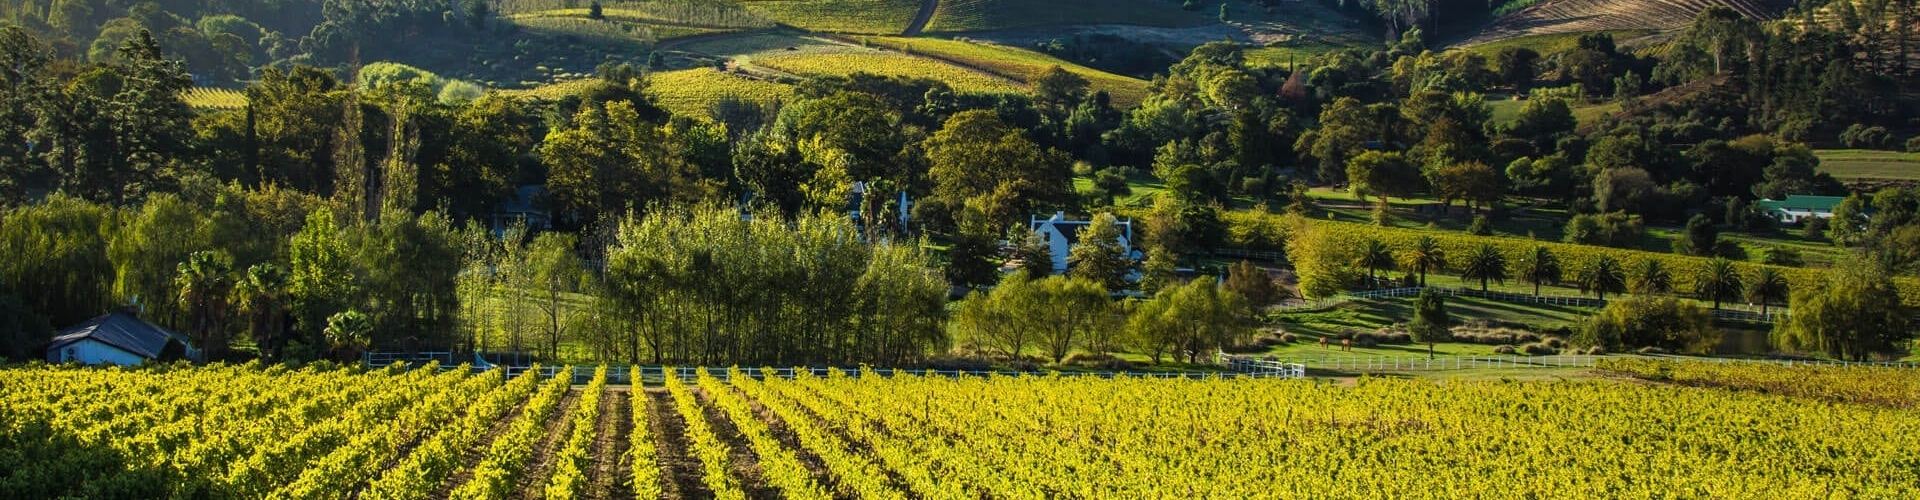 cape-winelands-south-africa